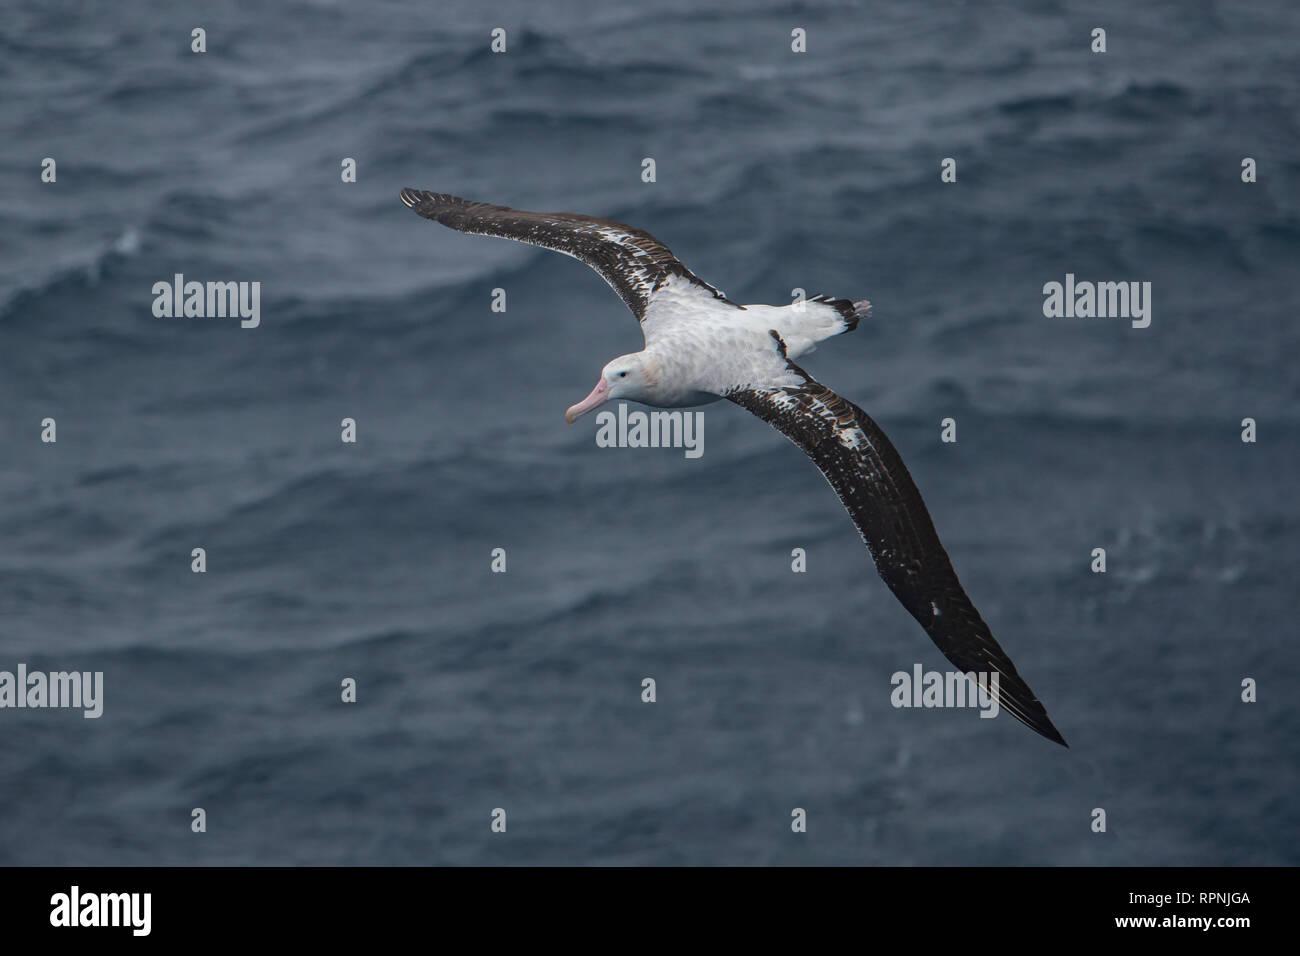 Southern Royal Albatross, Dimodea epomophora, near Shag Island, South Georgia - Stock Image